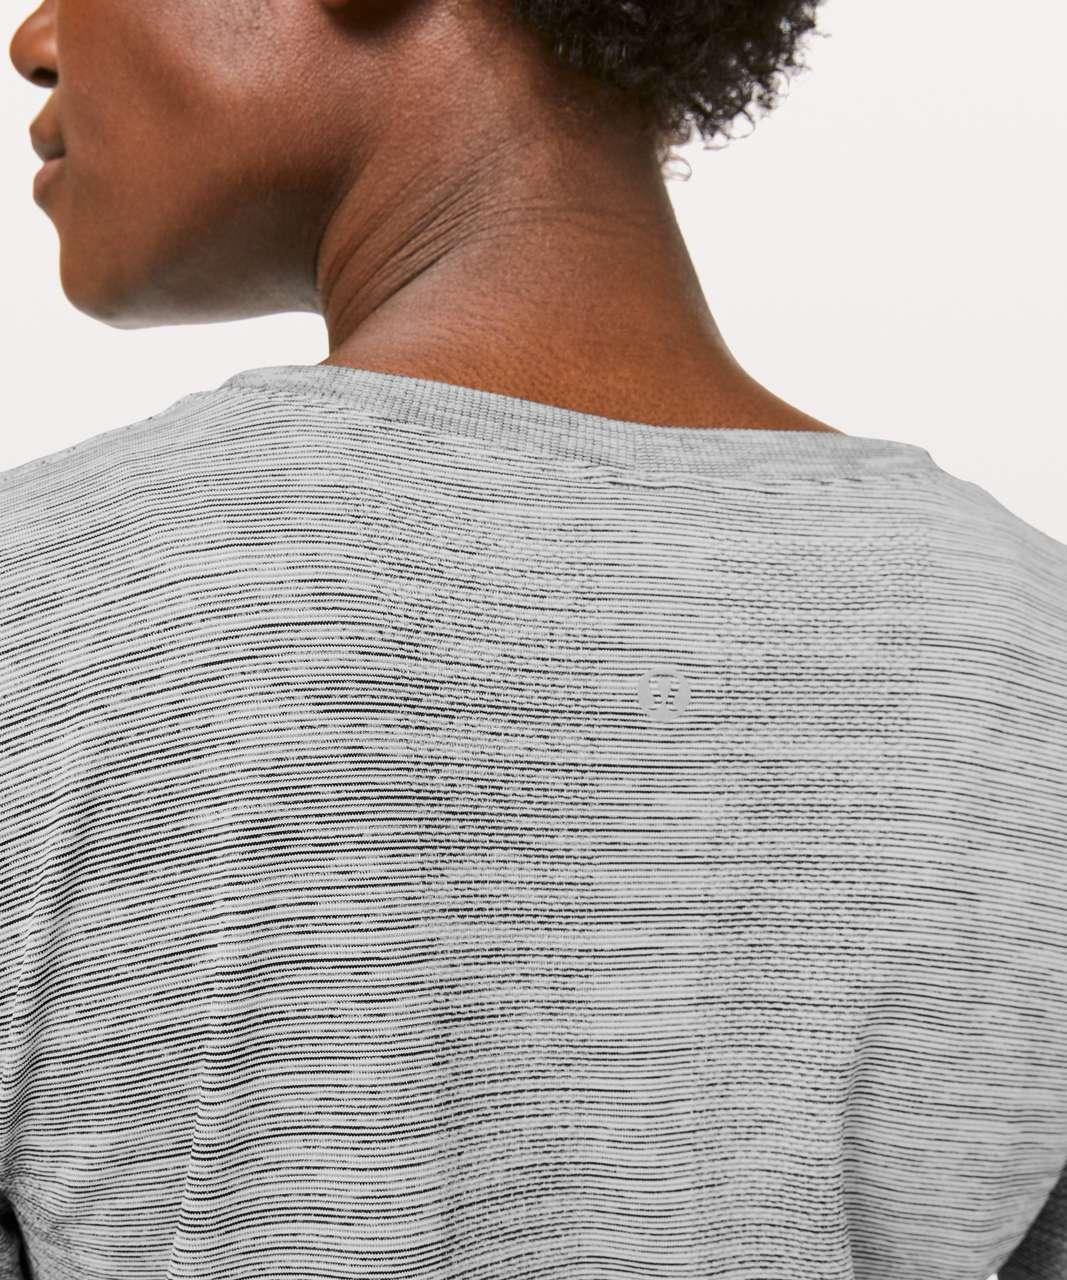 Lululemon Swiftly Tech Long Sleeve (Breeze) *Relaxed Fit - Sheer Blue / White / Black